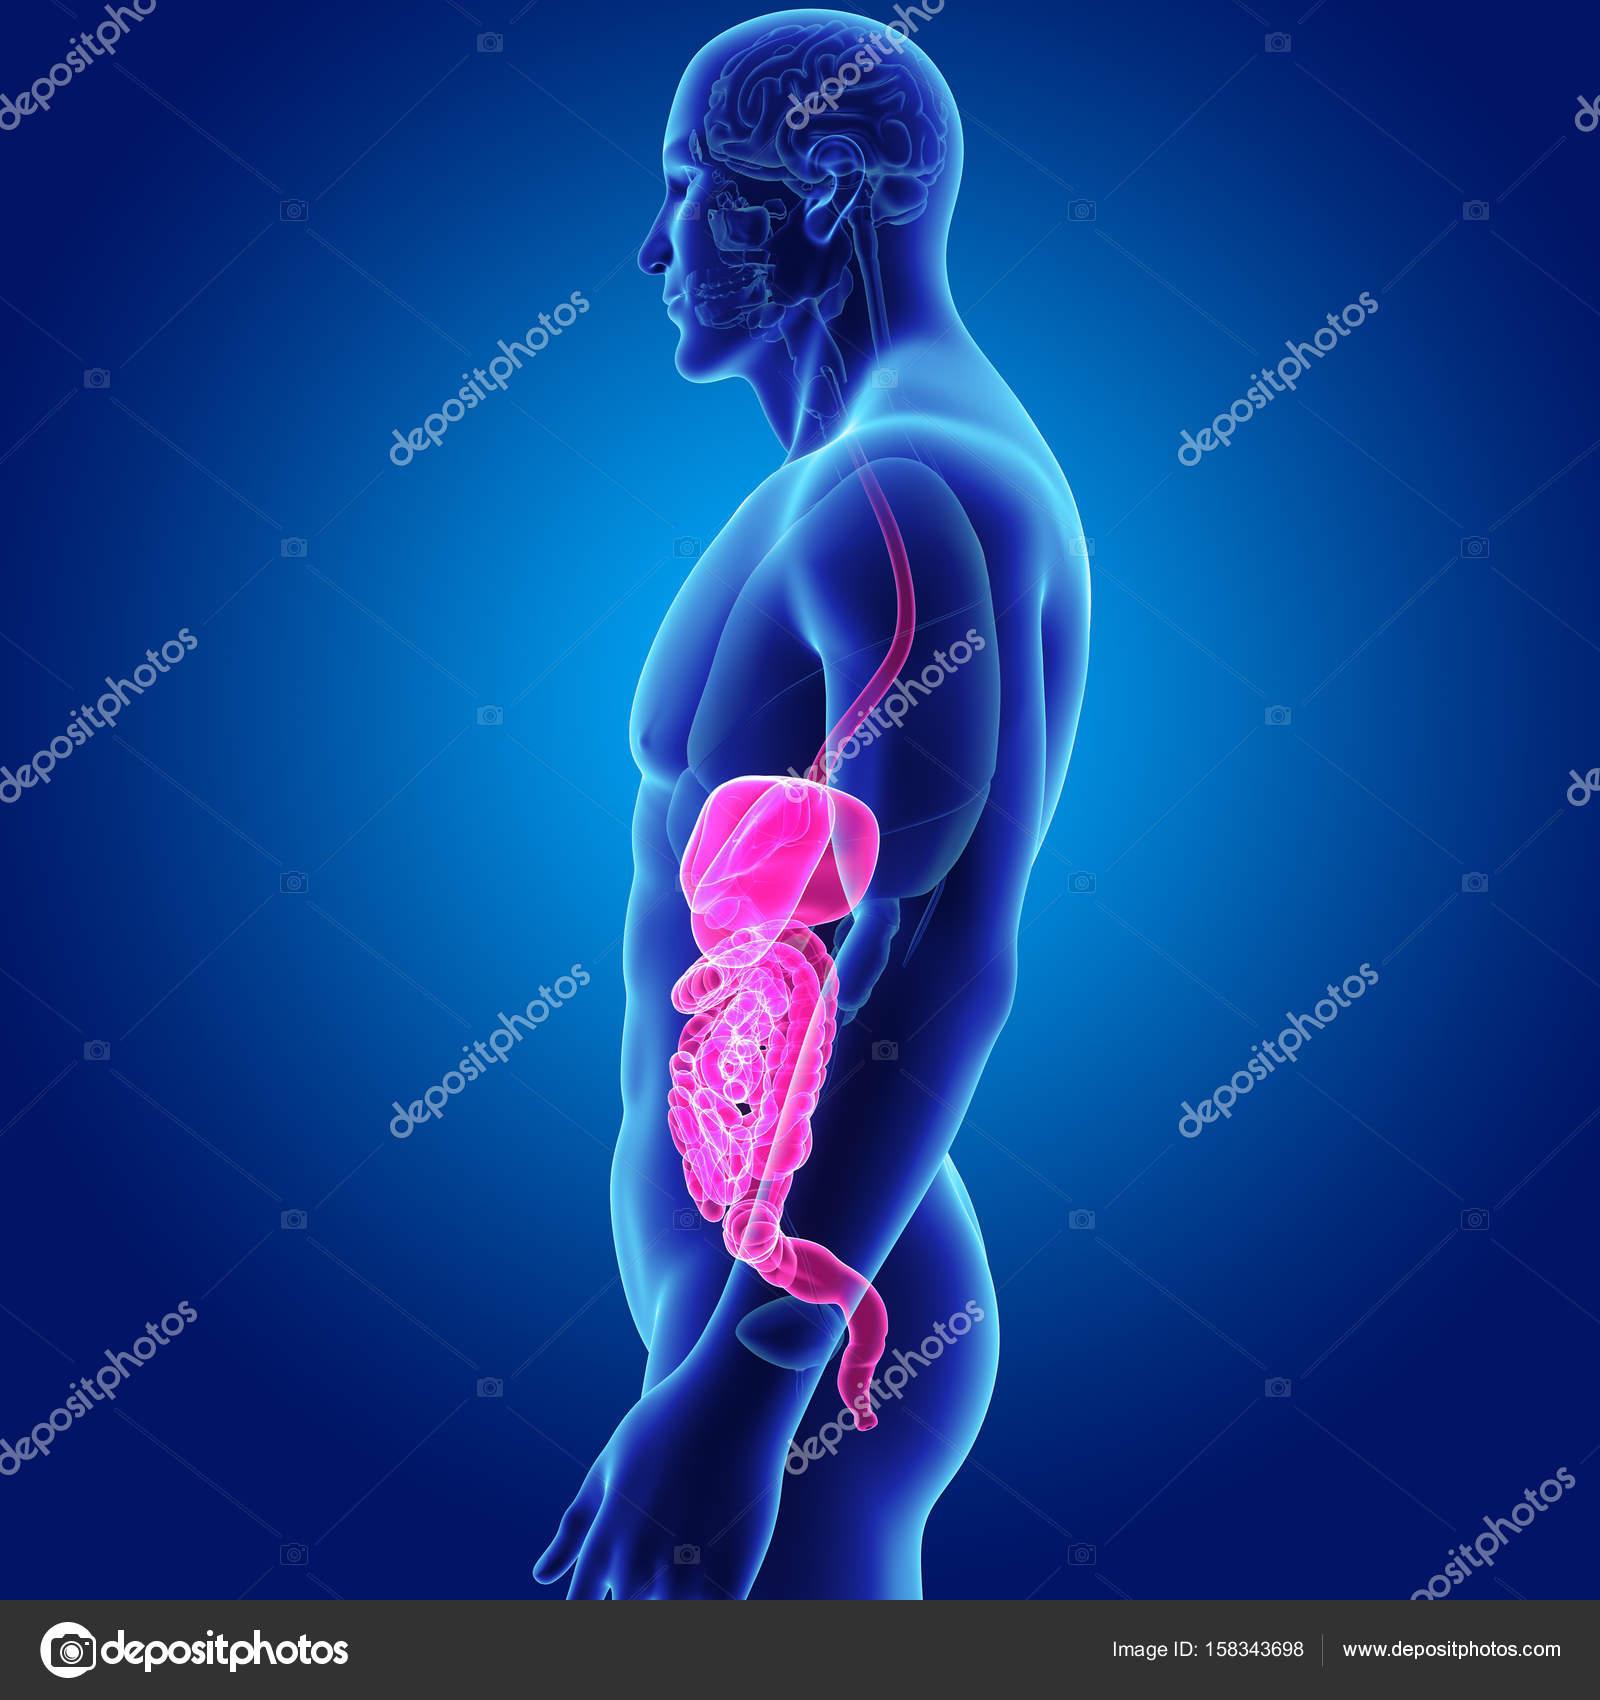 Verdauungssystem mit Organen — Stockfoto © sciencepics #158343698